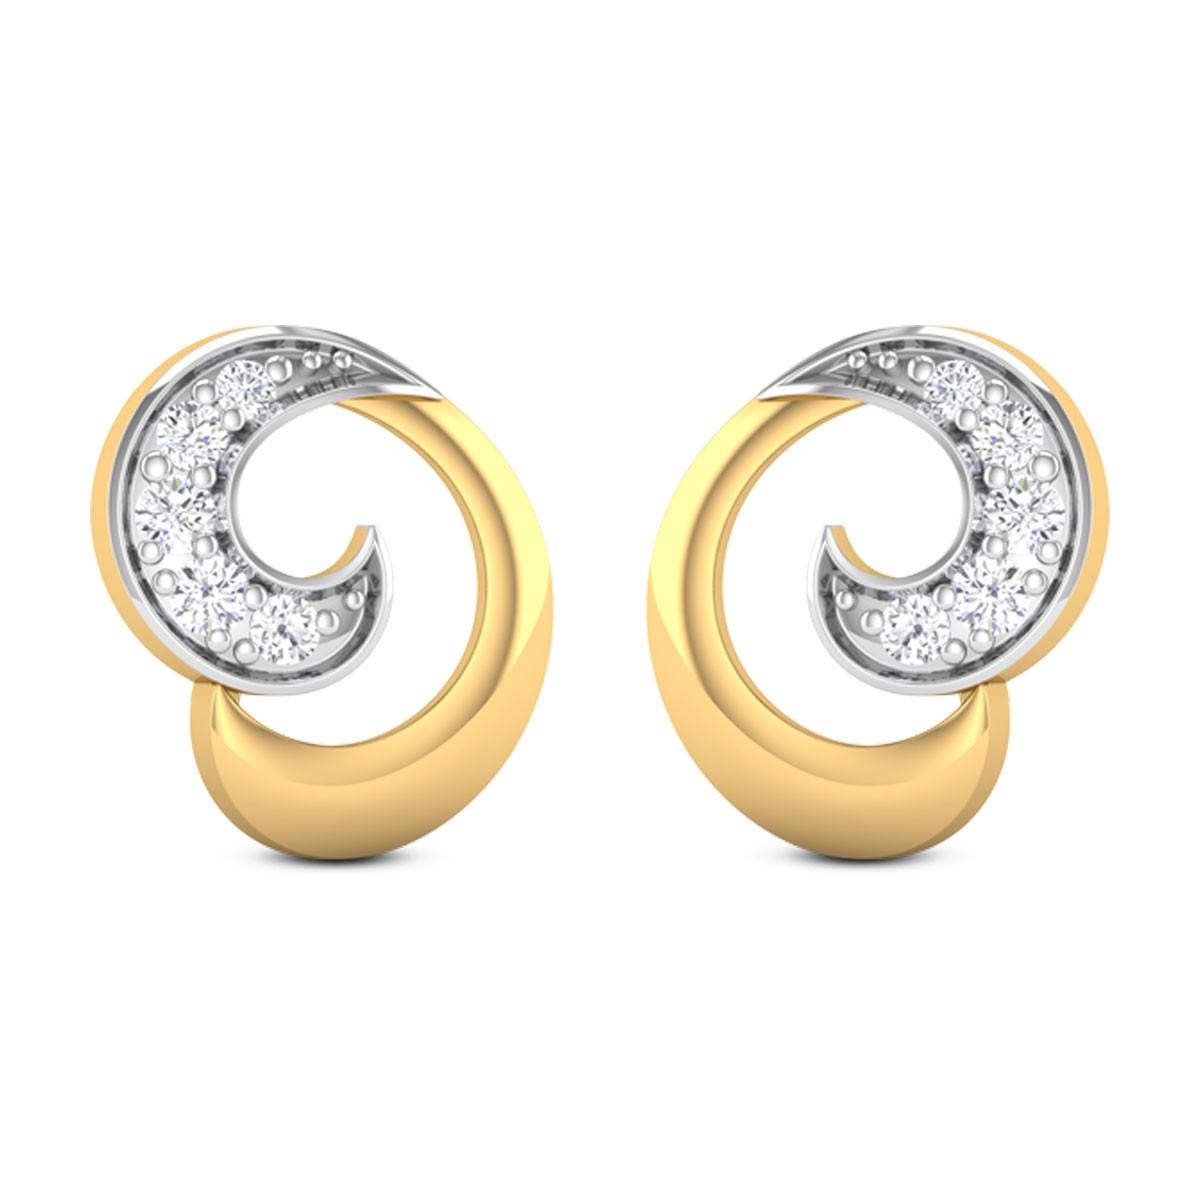 Kina Diamond Earrings